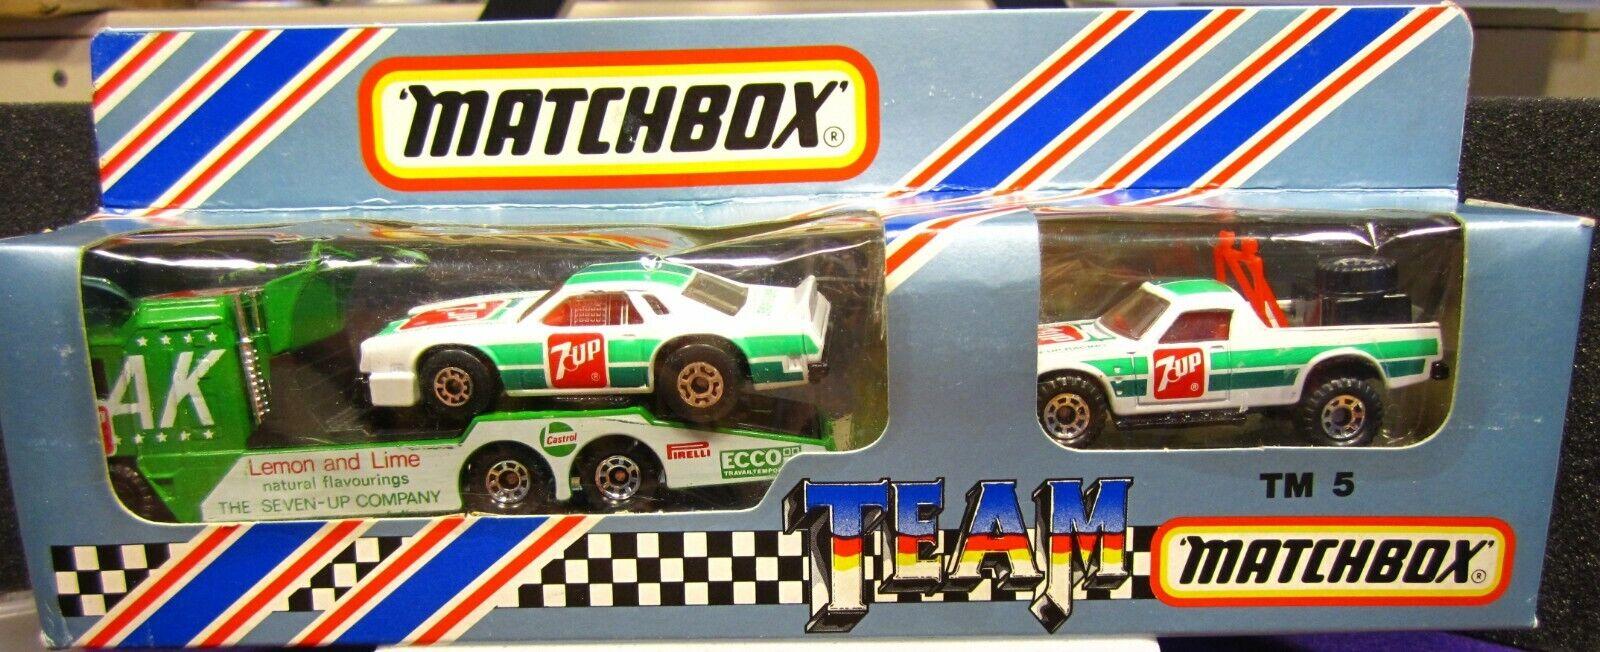 MATCHBOX TEAM CONVOY, 7-UP RACING SET, RUFF TREK, CHEVY STOCKER, KENWORTH  SET